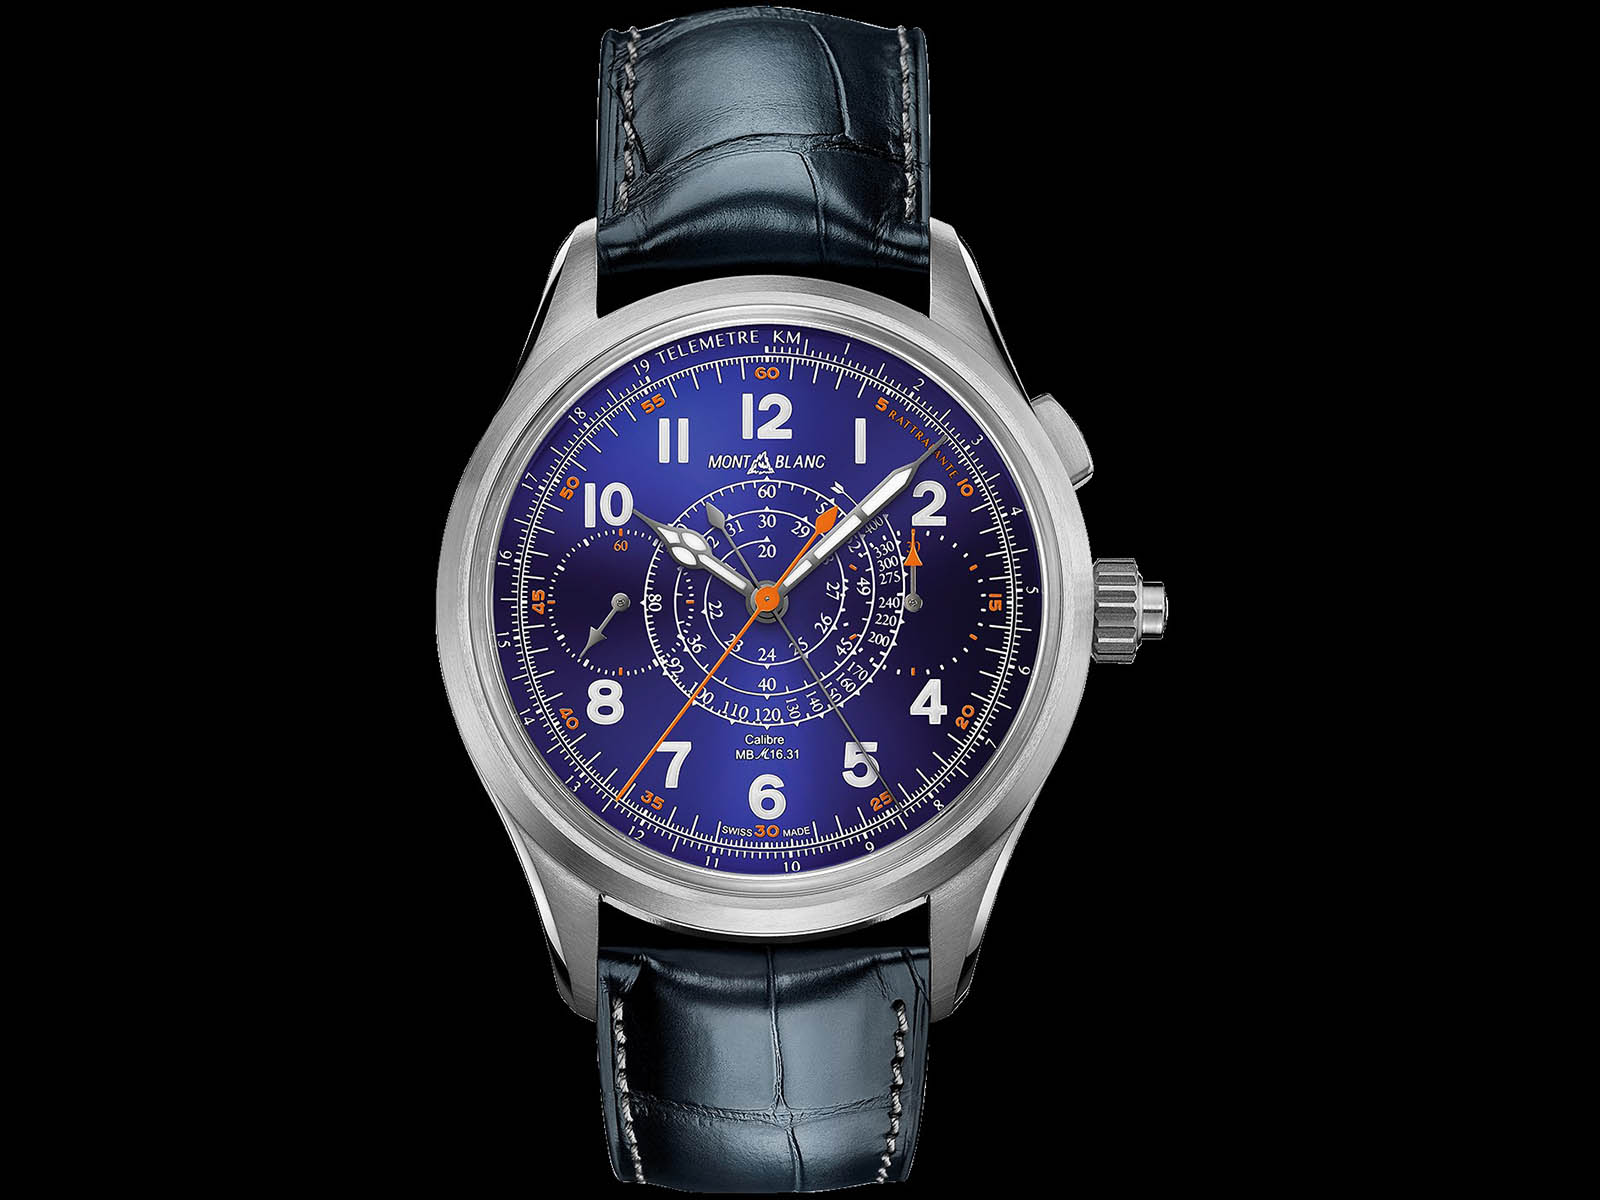 126006-montblanc-1858-split-second-chronograph-2.jpg